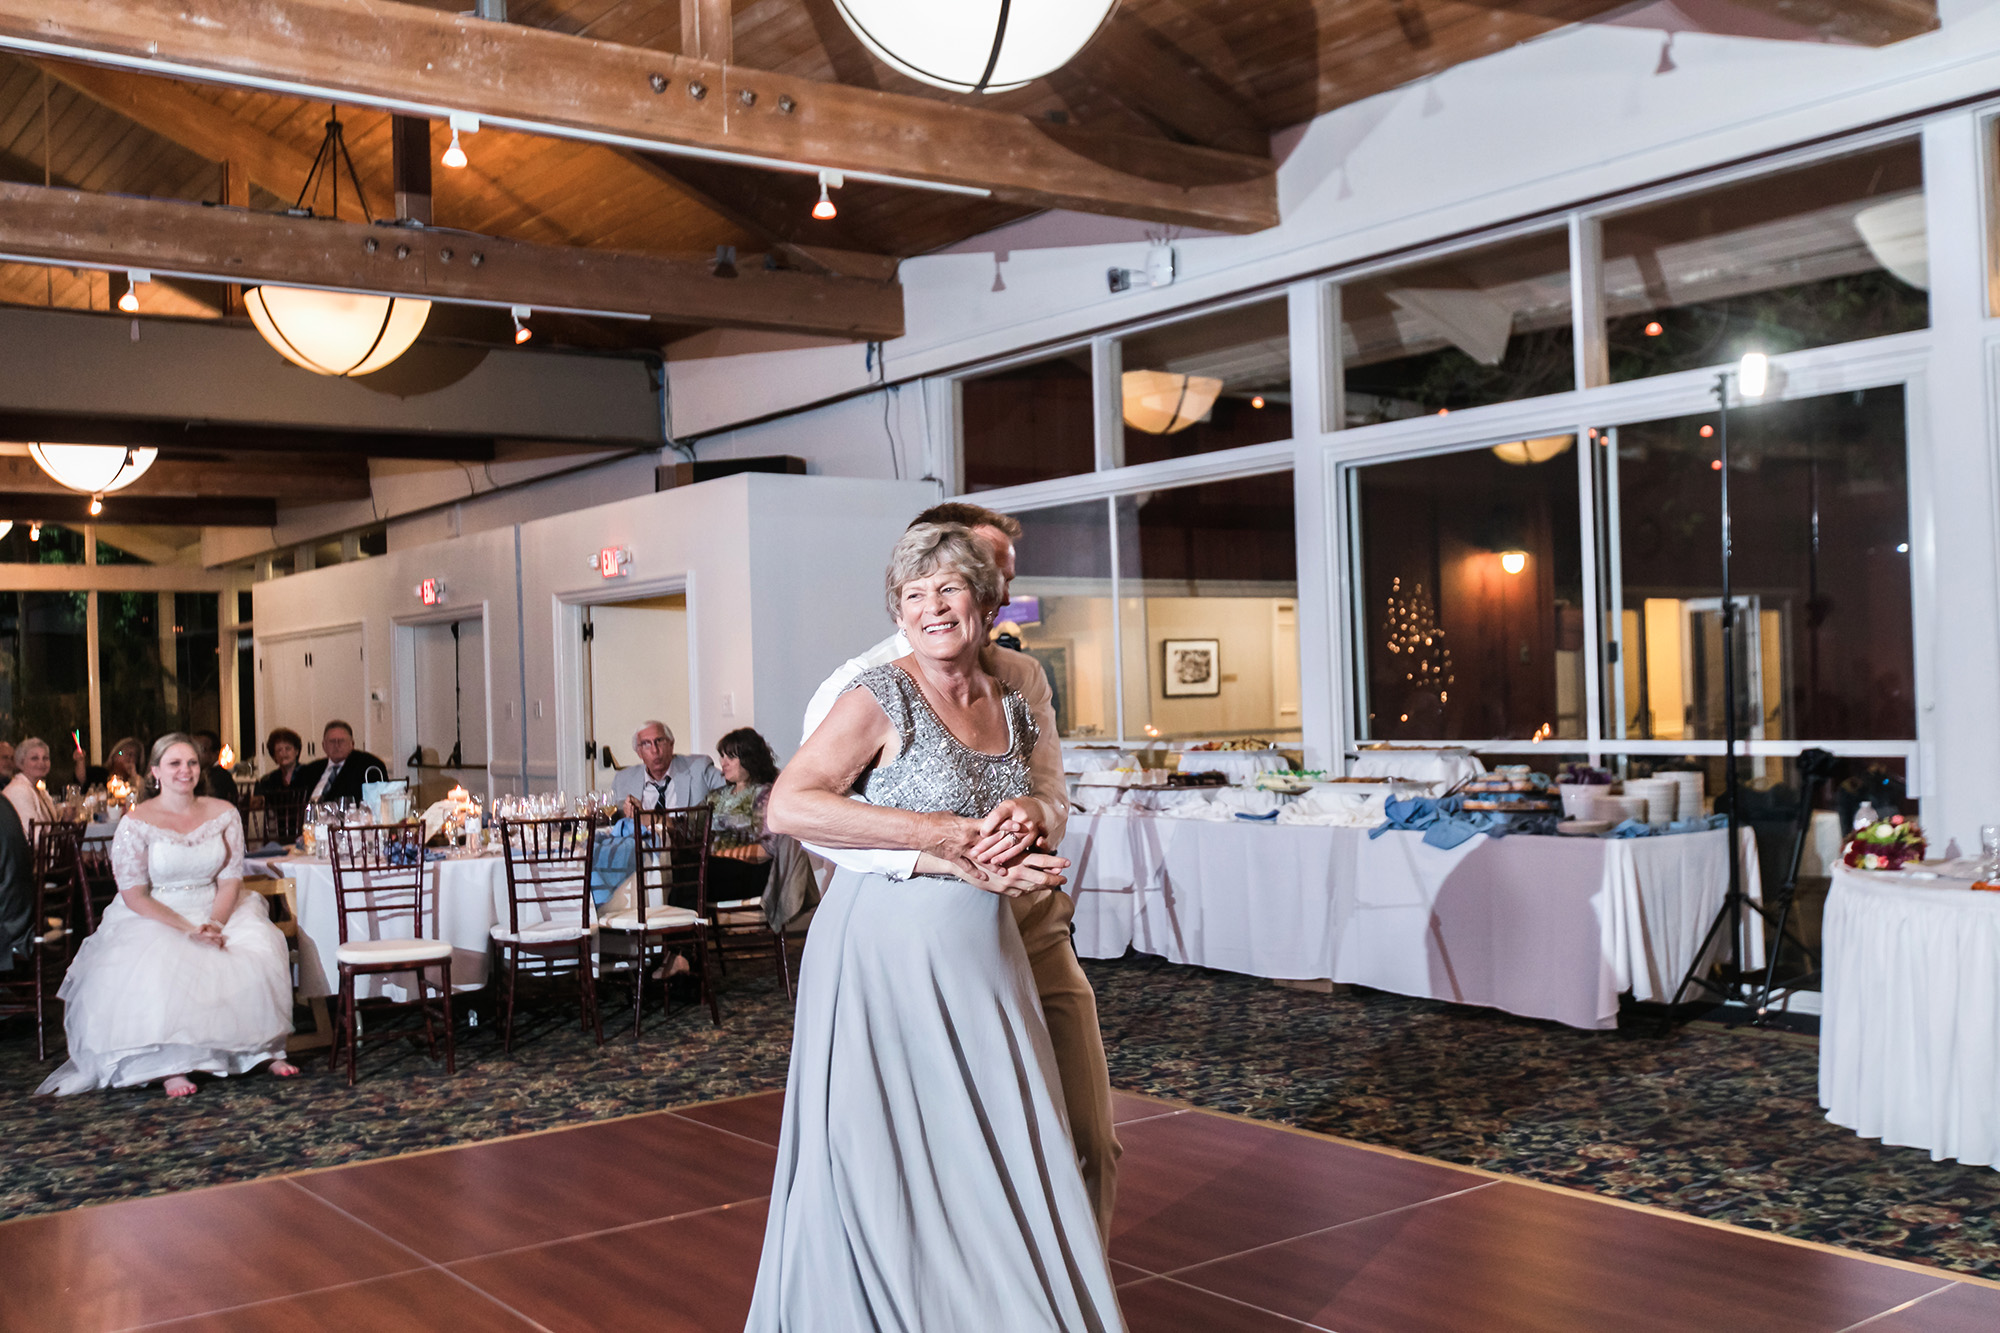 unforgettable-st-monica-wedding-carrie-vines-photography-125.jpg